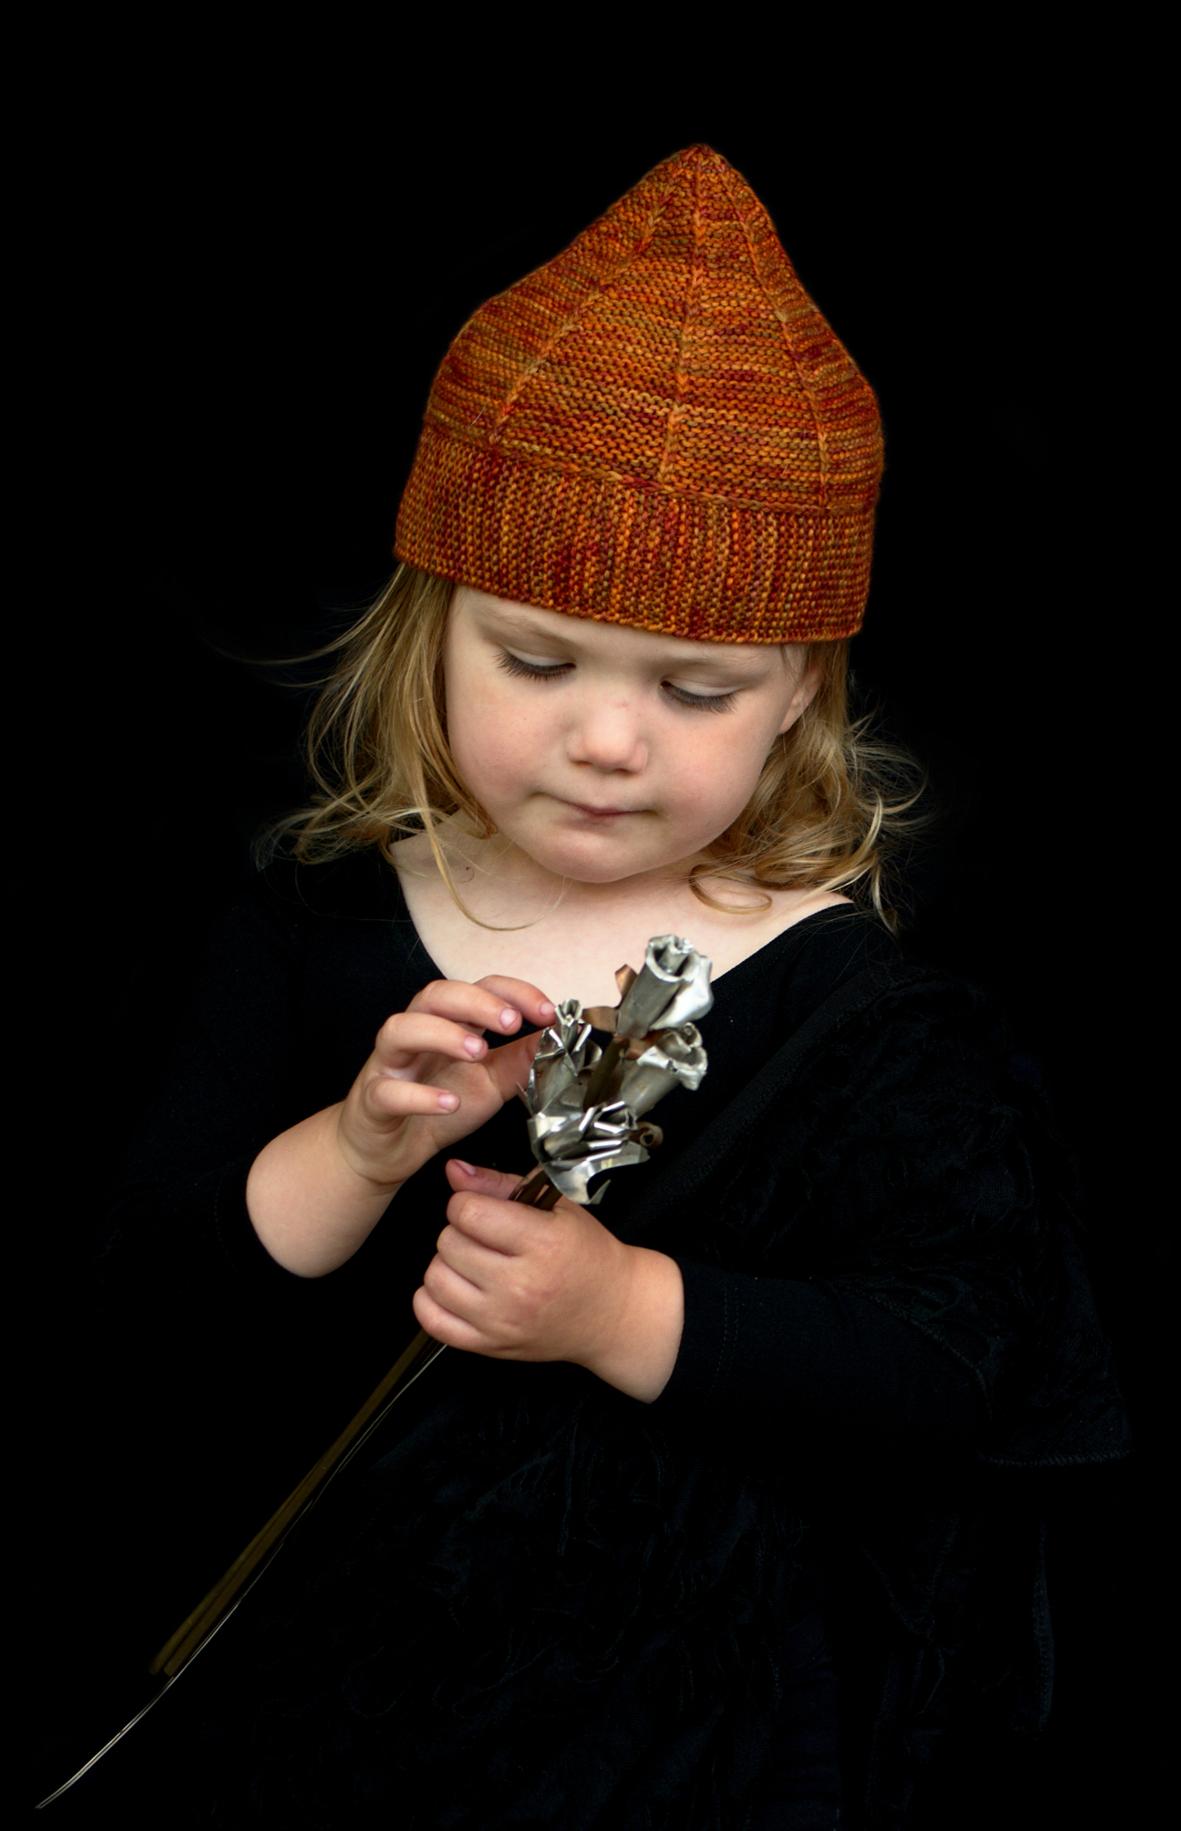 Hadleight hand knitting pattern for sock 4ply fingering yarn